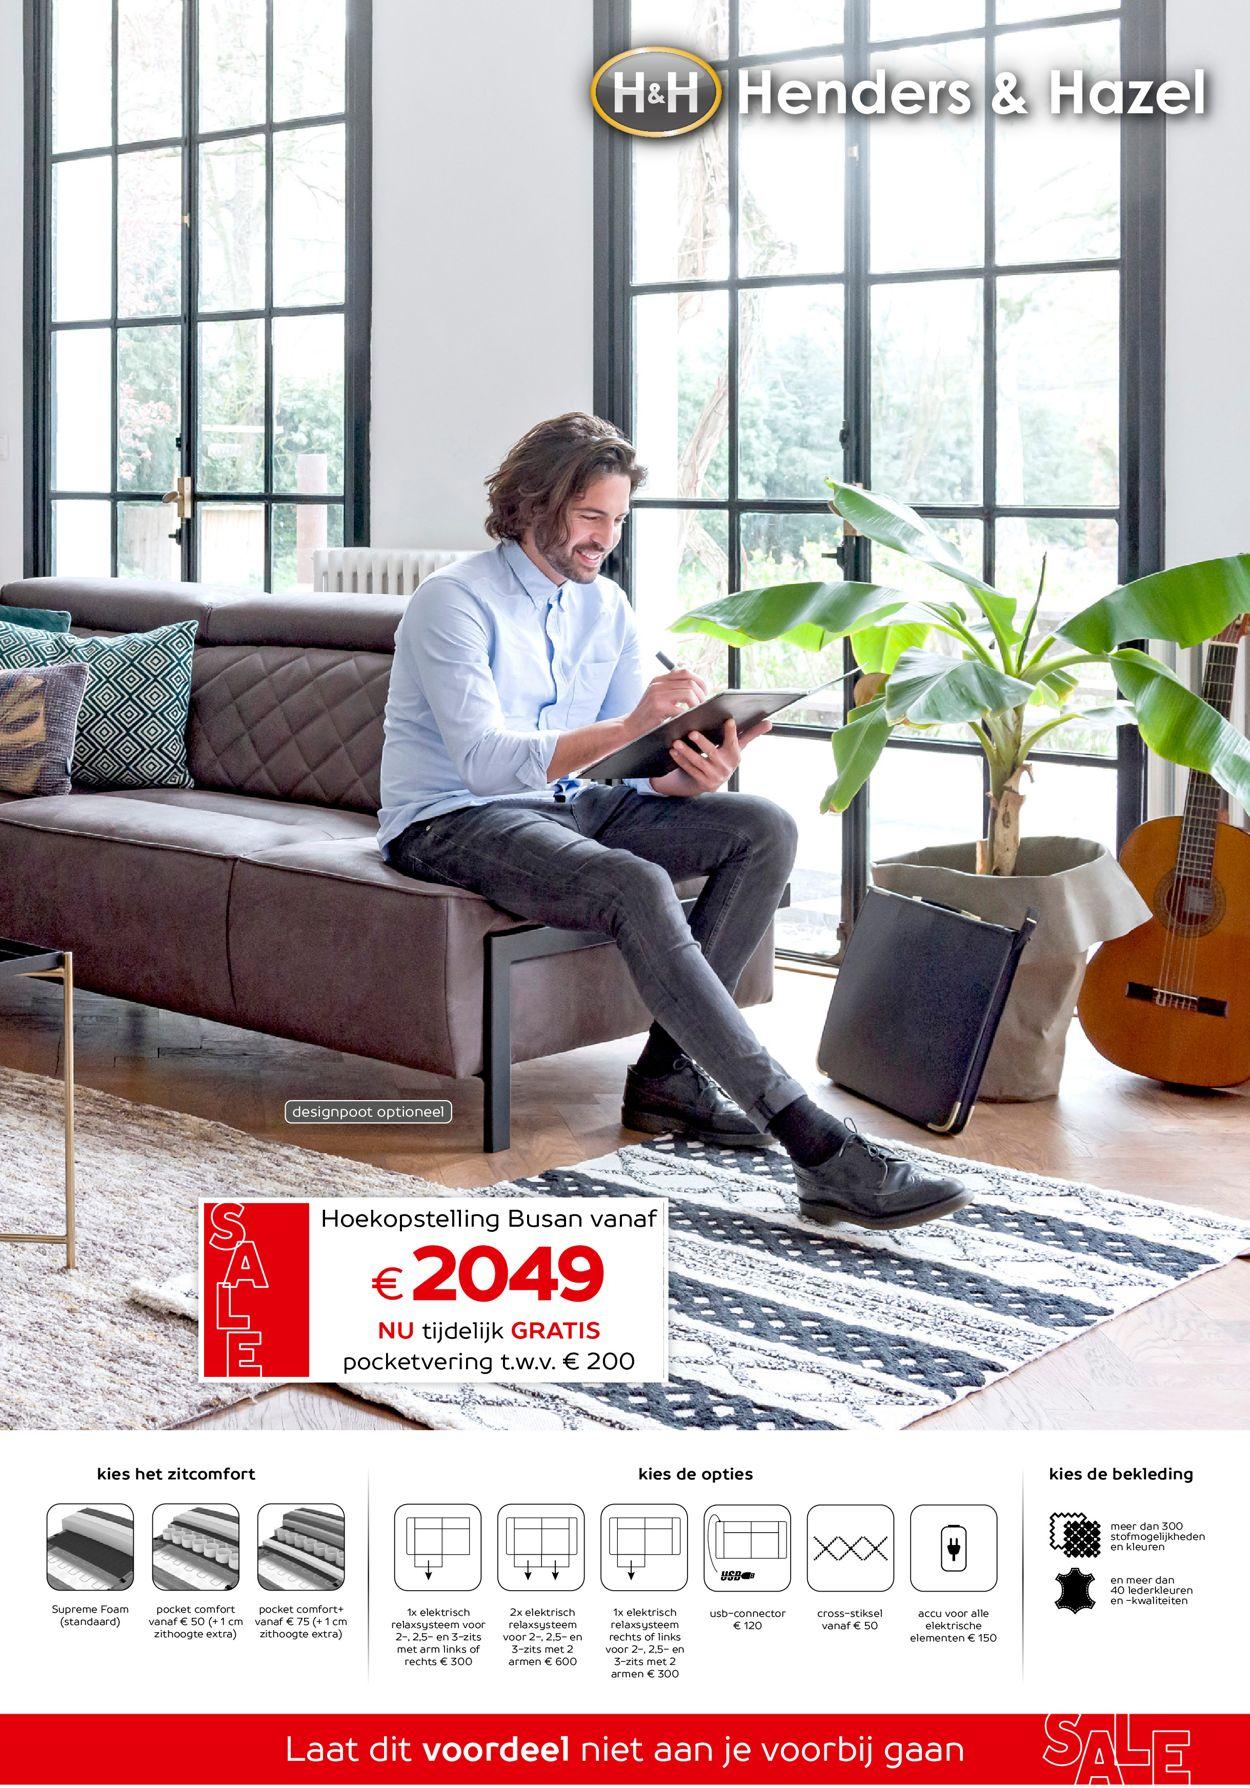 Catalogus van Henders & Hazel van 23.07.2020